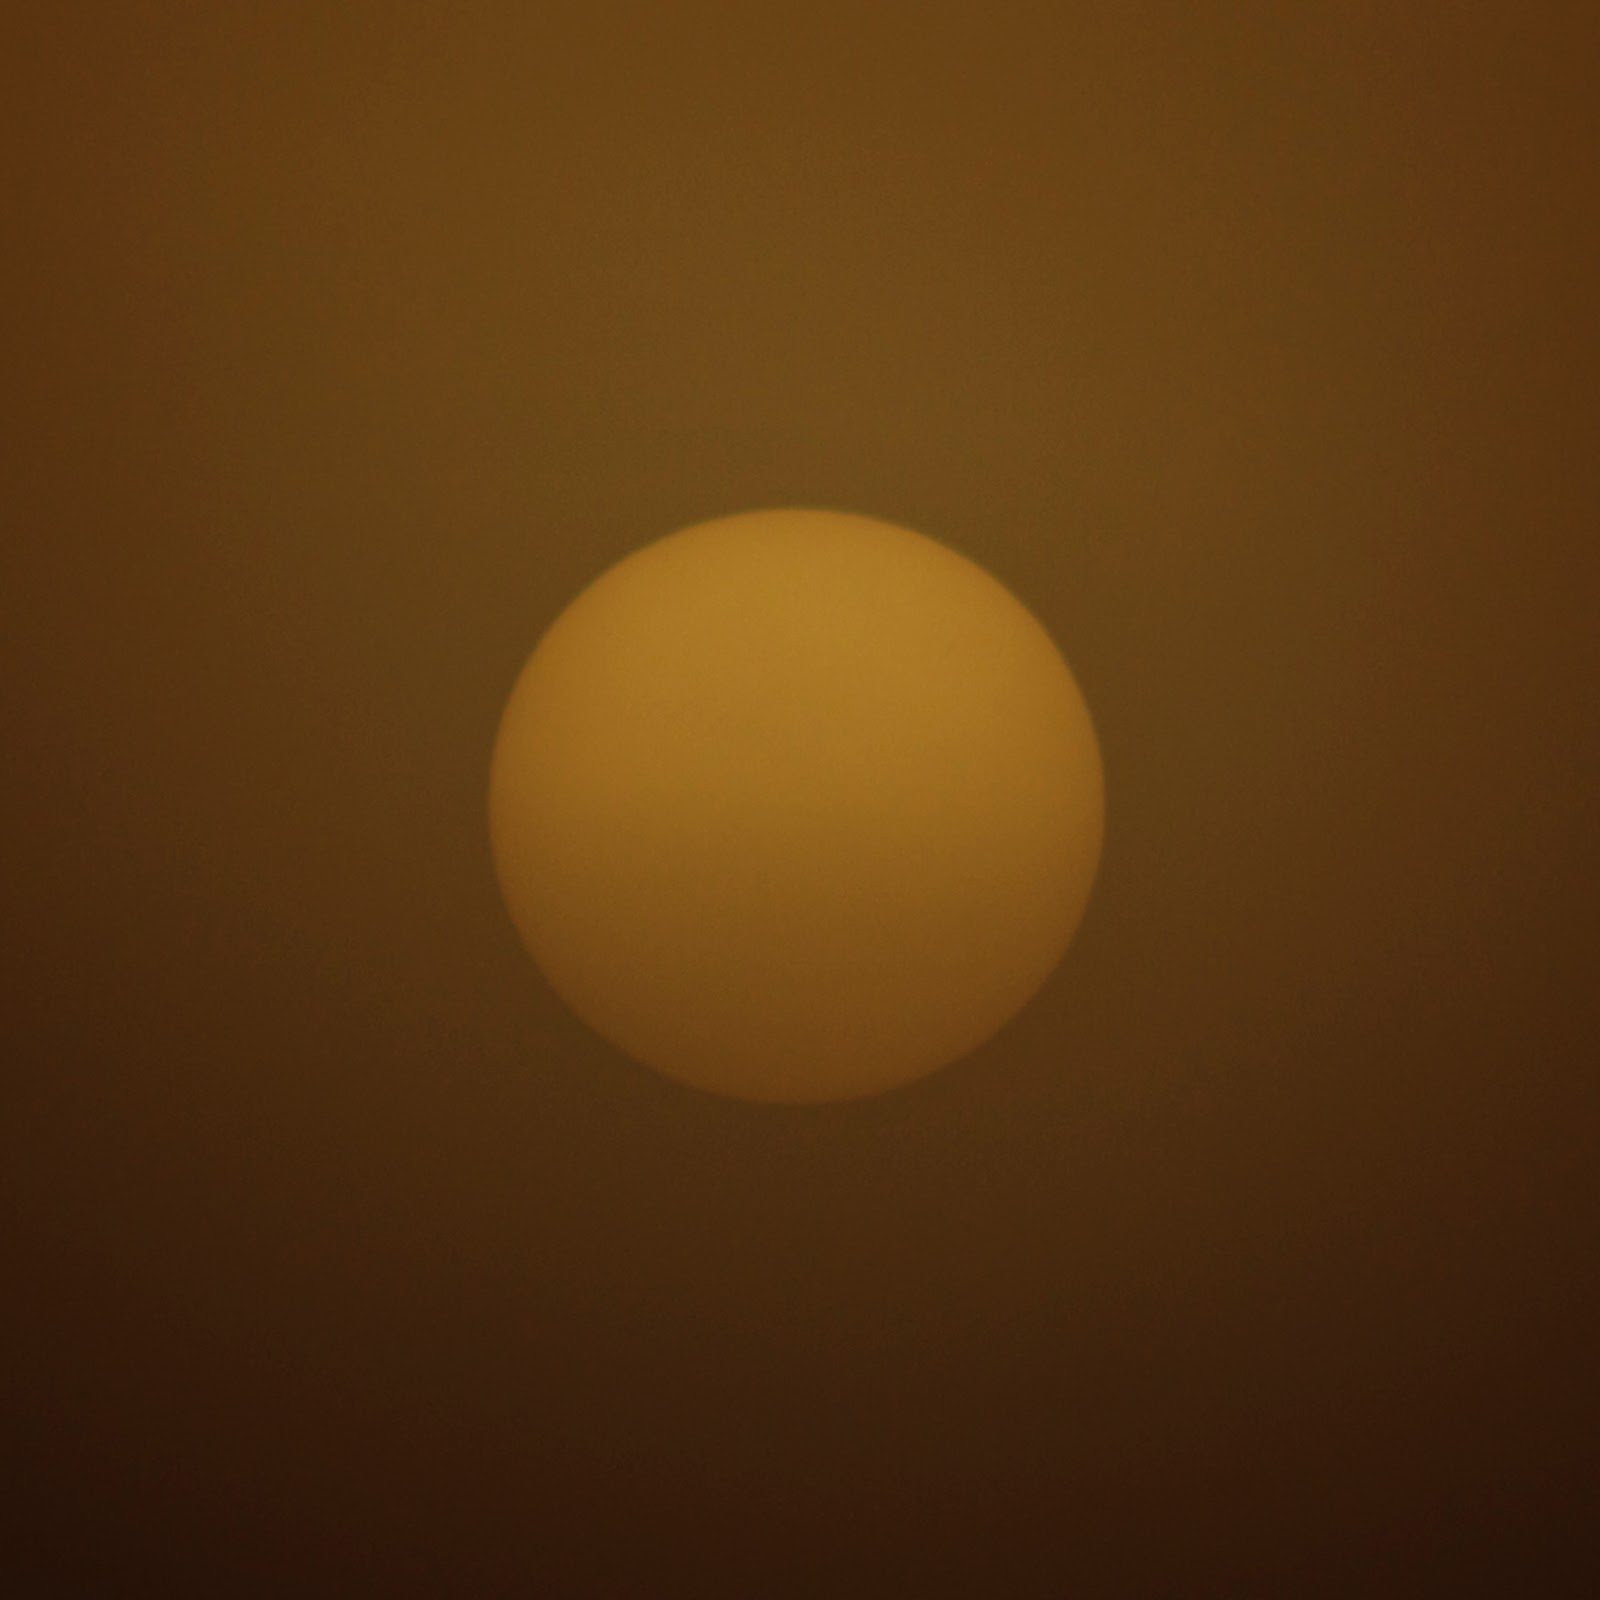 orange ball sunrise